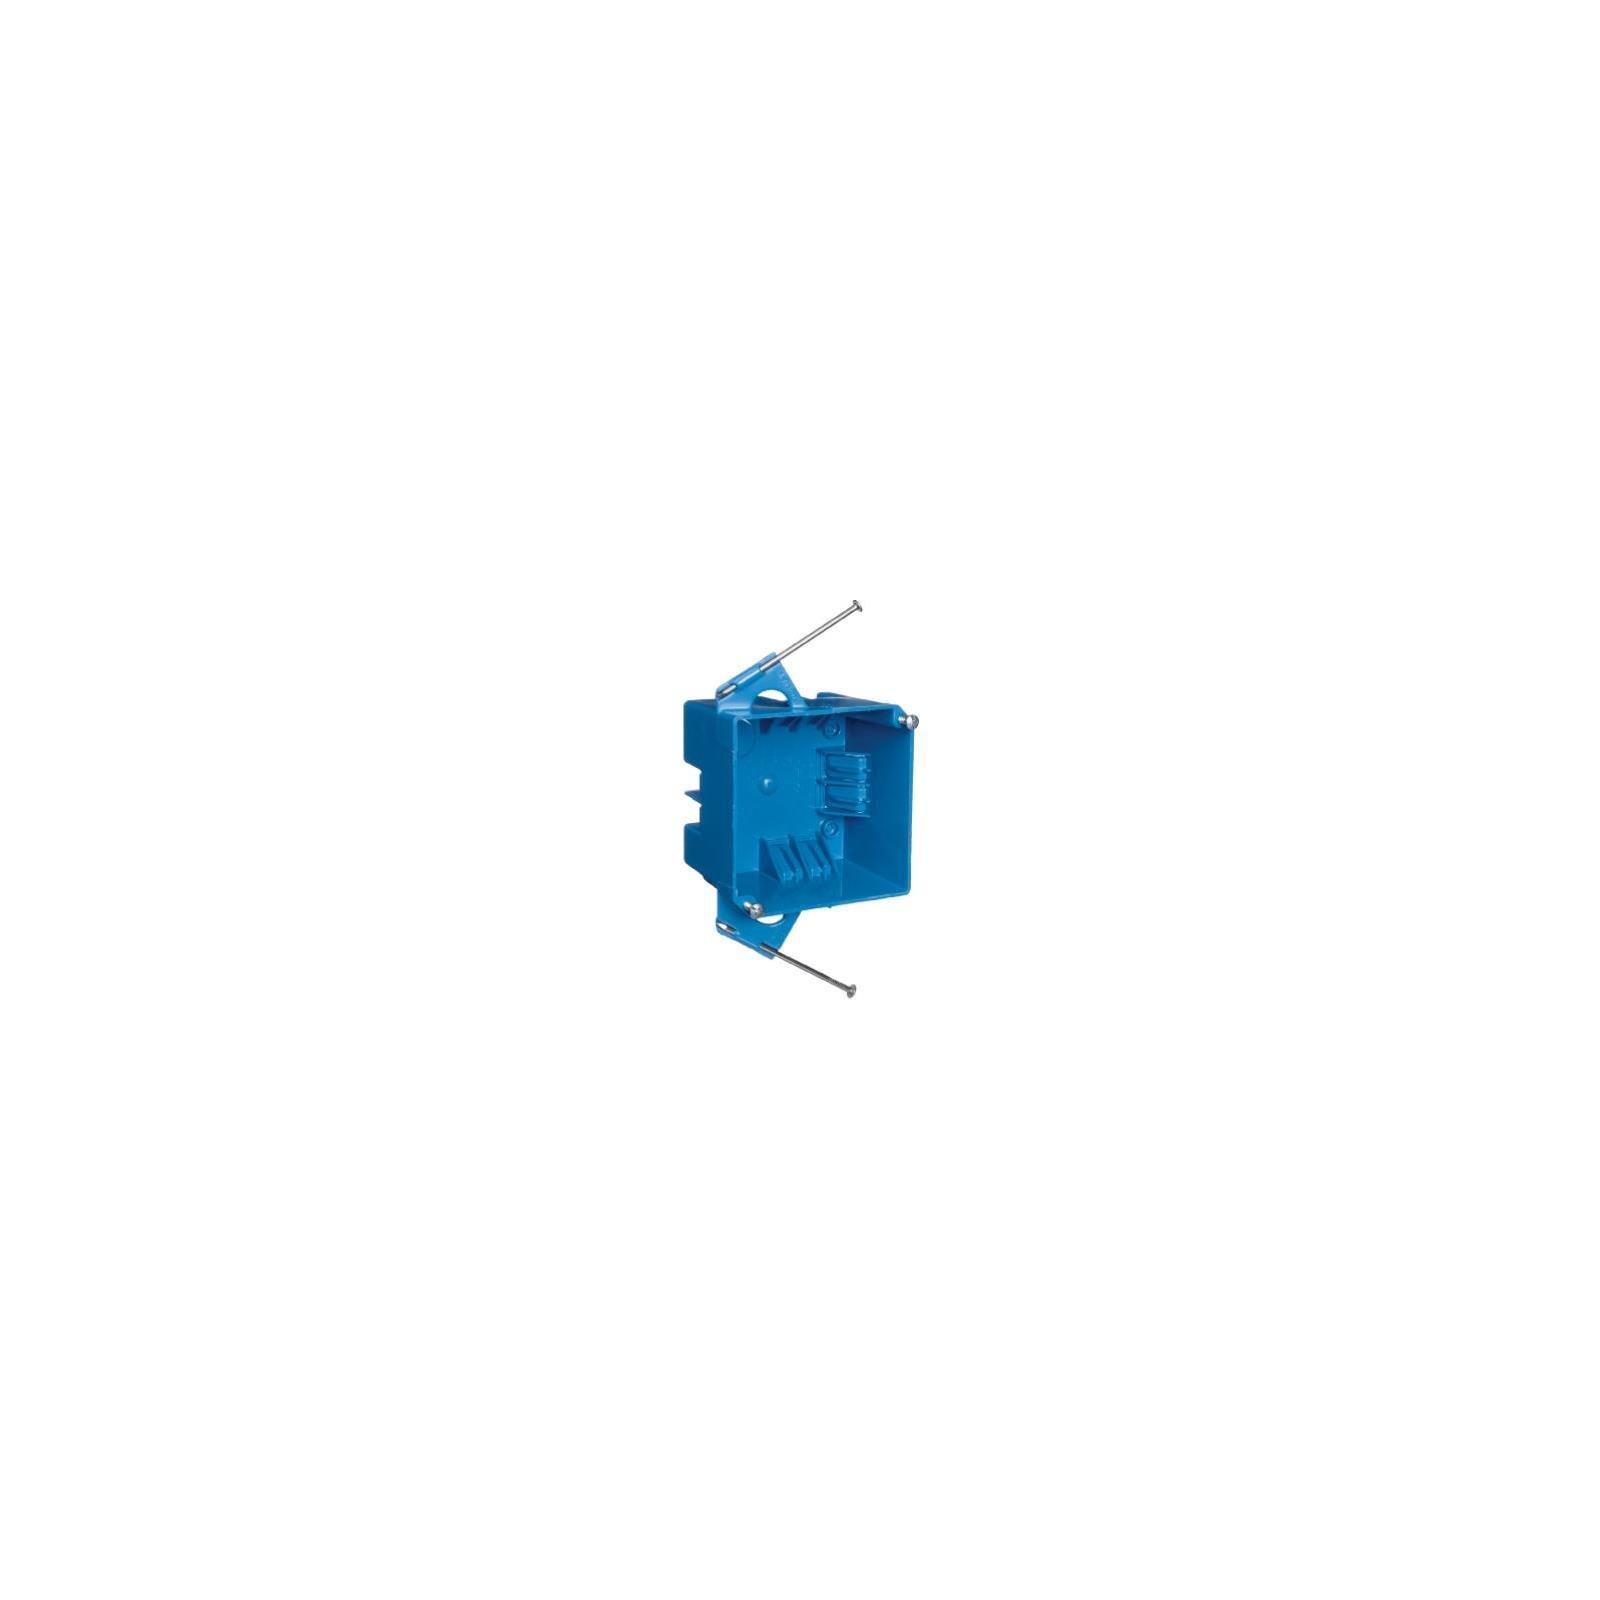 Carlon Junction Box 32 Cu In Pvc 2 Gang Blue Bulk